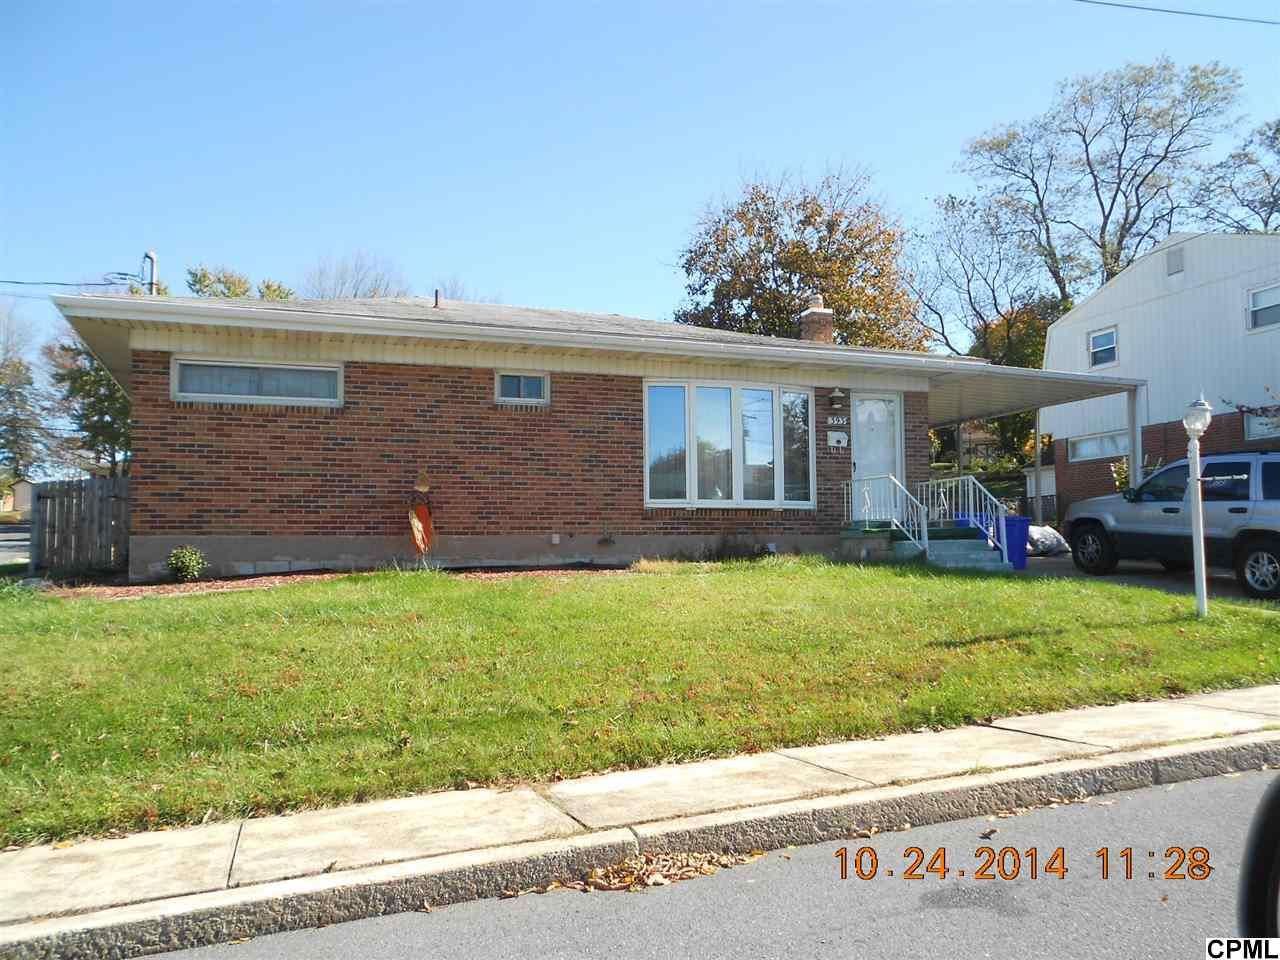 393 N 19th St, Camp Hill, PA 17011